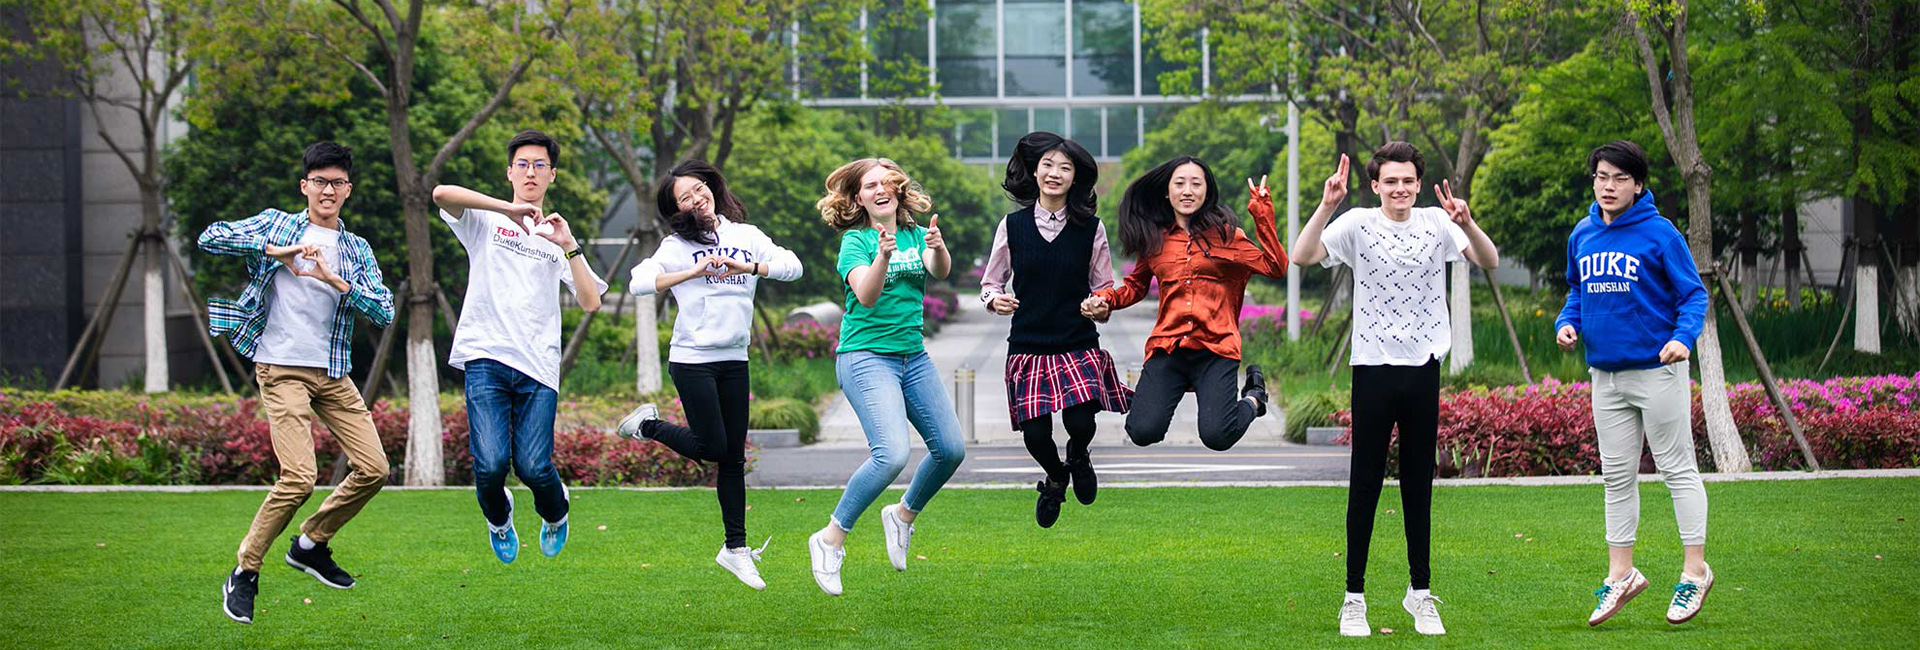 Duke Kunshan sees largest enrollment of international students